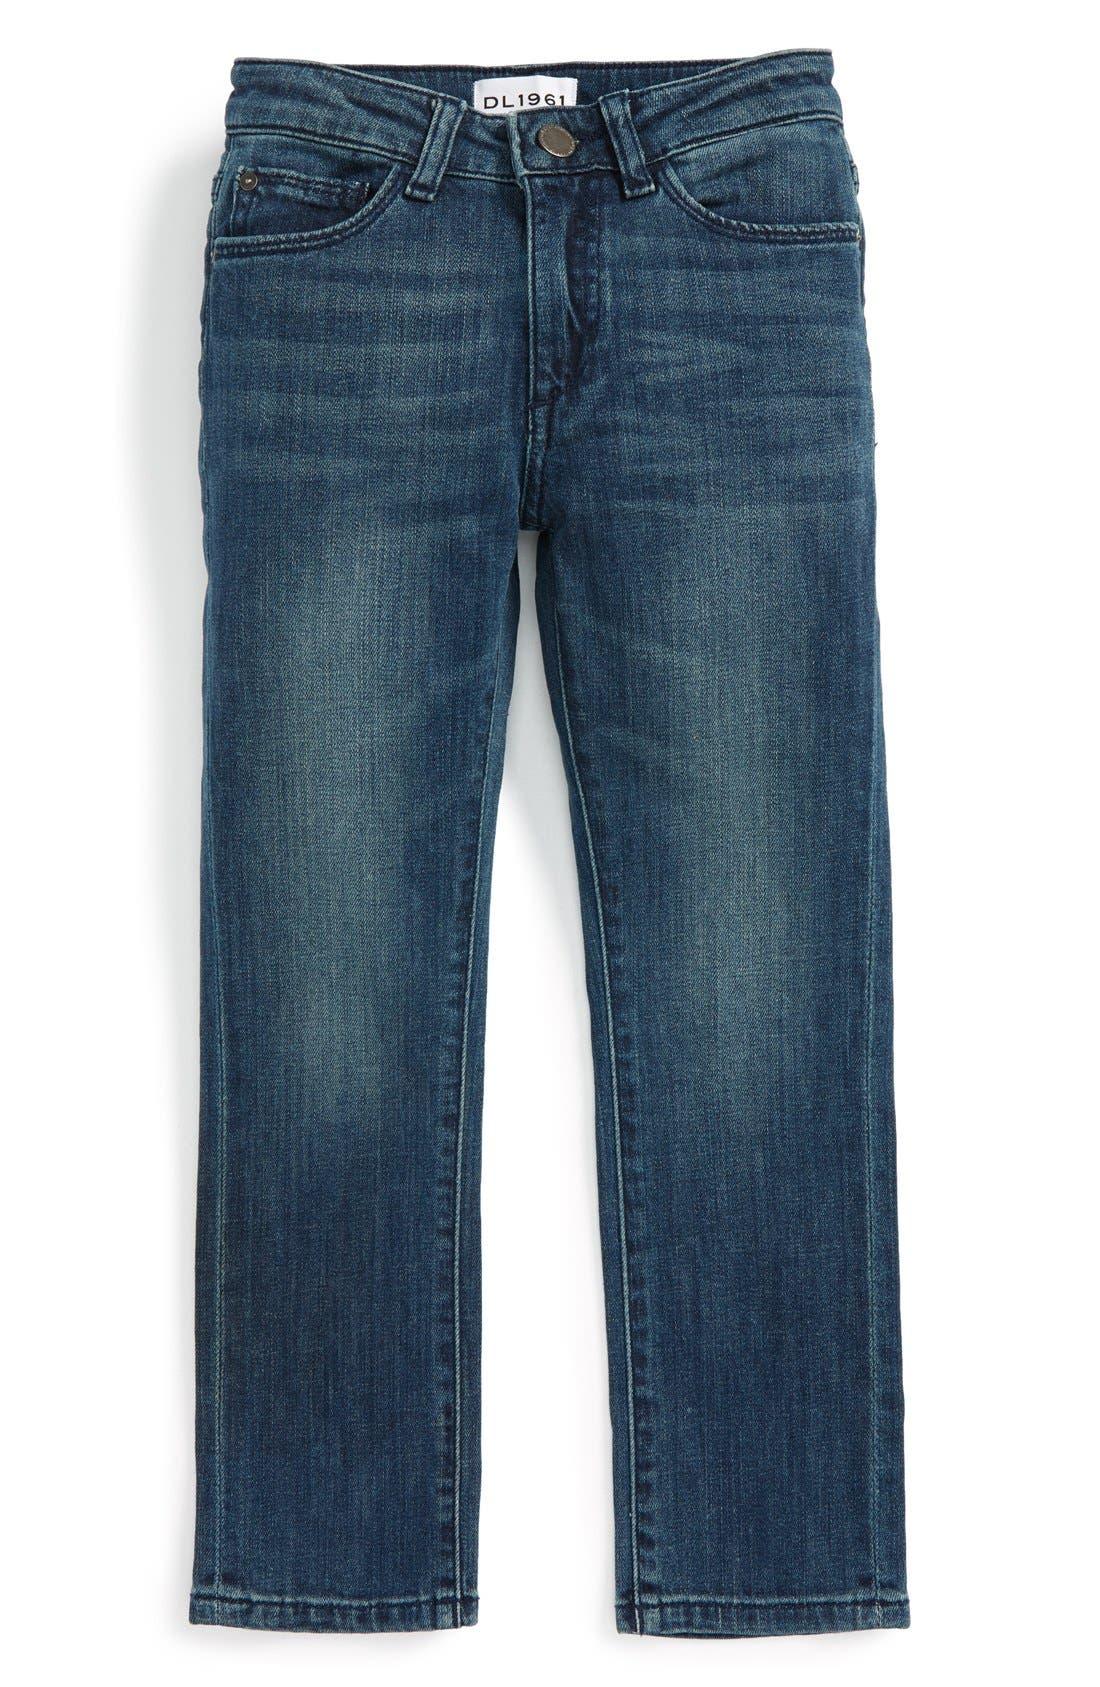 Main Image - DL1961 'Hawke' Skinny Jeans (Toddler Boys & Little Boys)